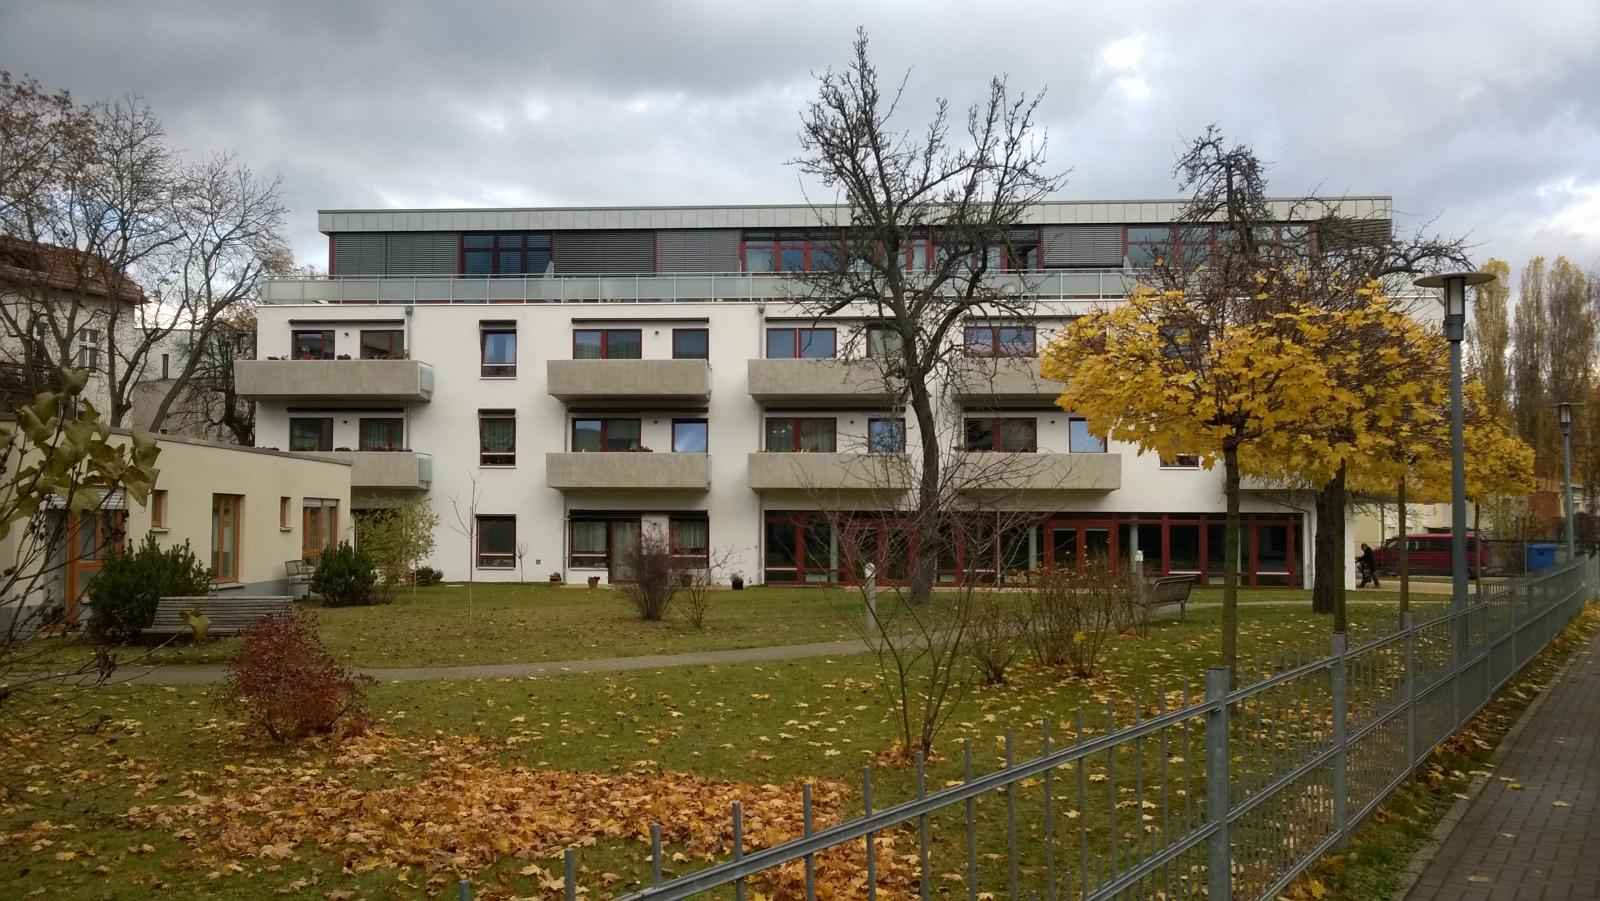 Seniorenzentrum 6, Berlin-Pankow